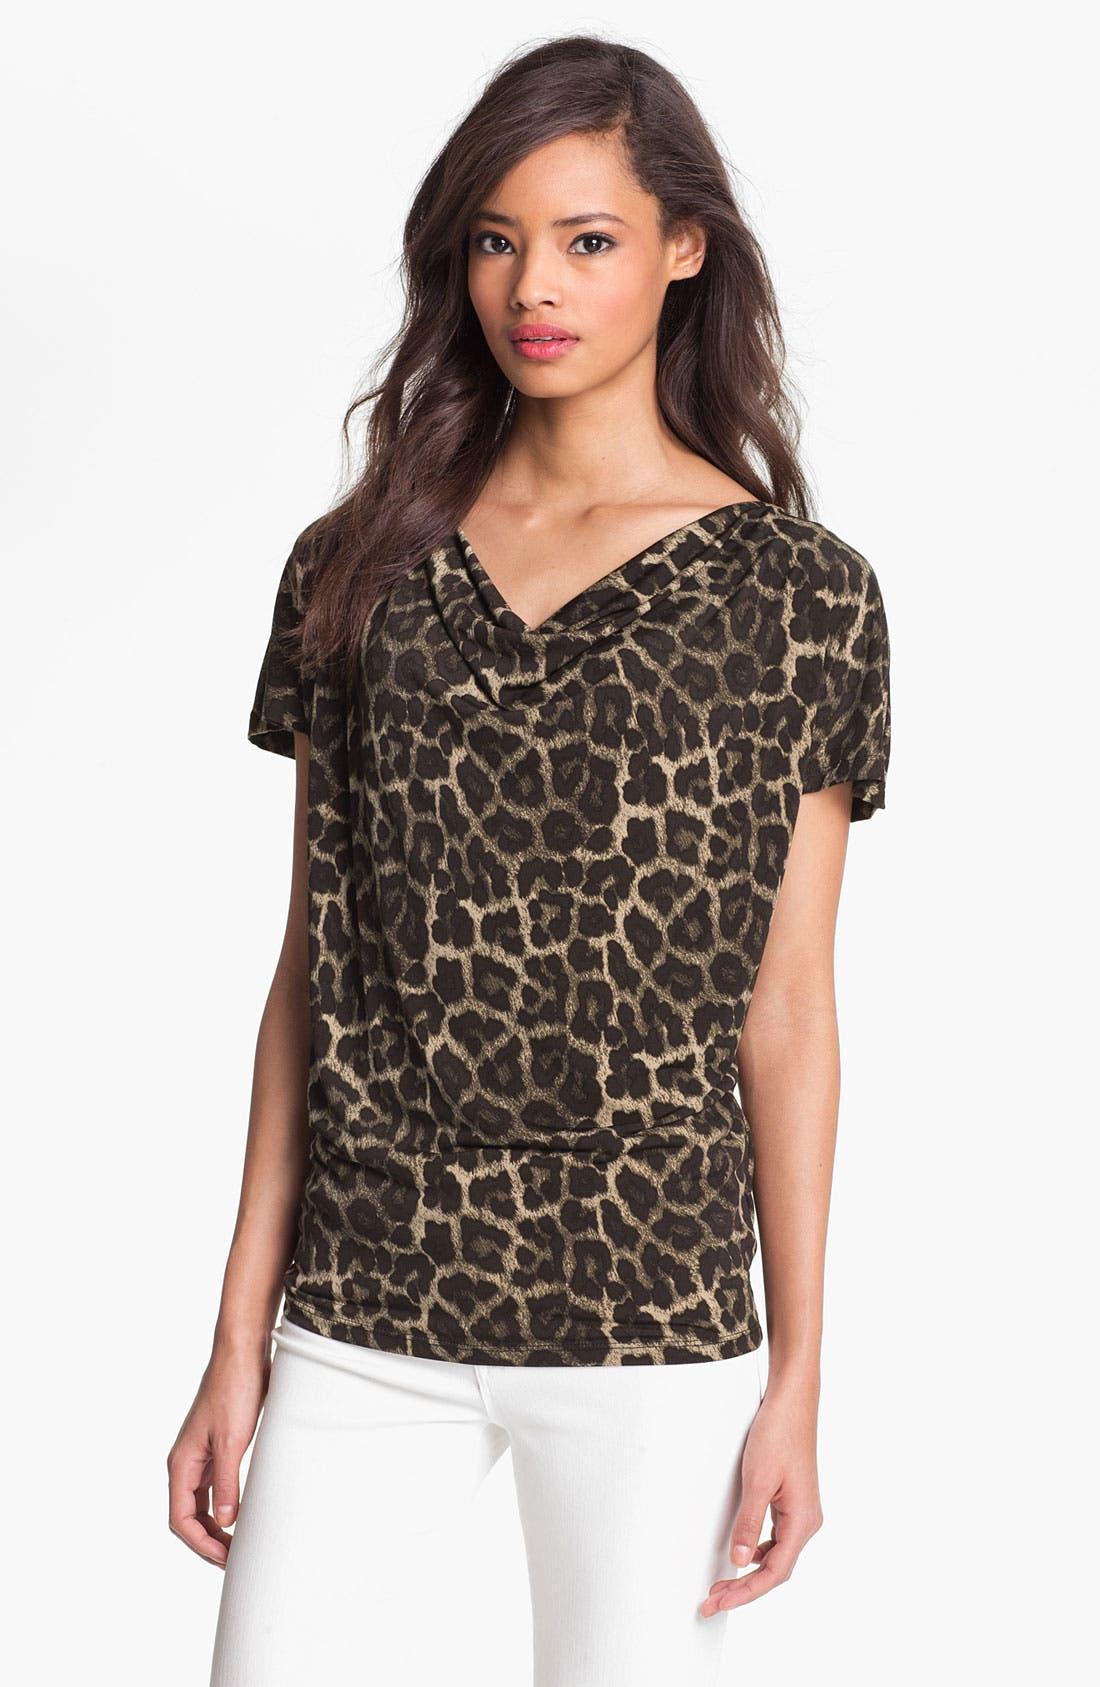 Alternate Image 1 Selected - MICHAEL Michael Kors 'Savannah' Leopard Print Top (Petite)